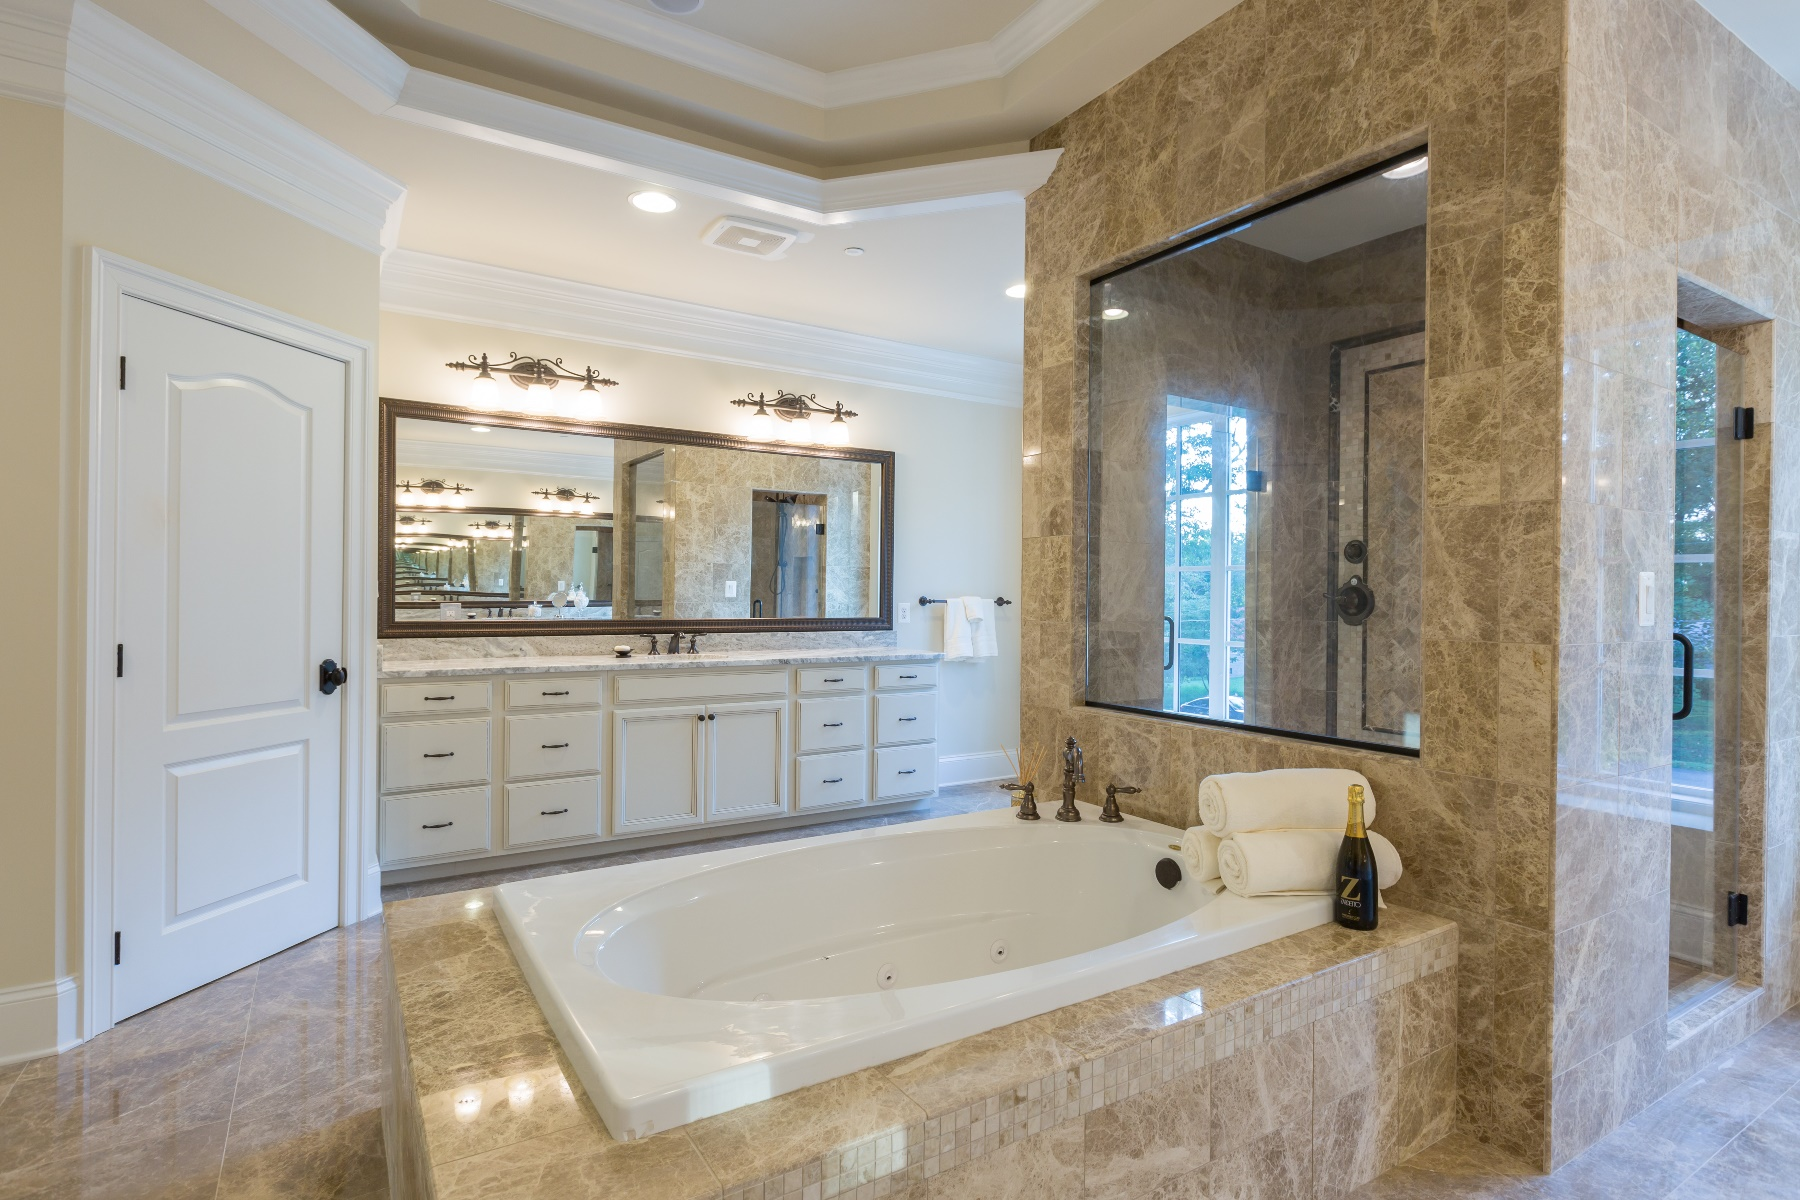 Additional photo for property listing at 8560 Horseshoe Lane, Potomac 8560 Horseshoe Ln Potomac, Maryland 20854 Vereinigte Staaten